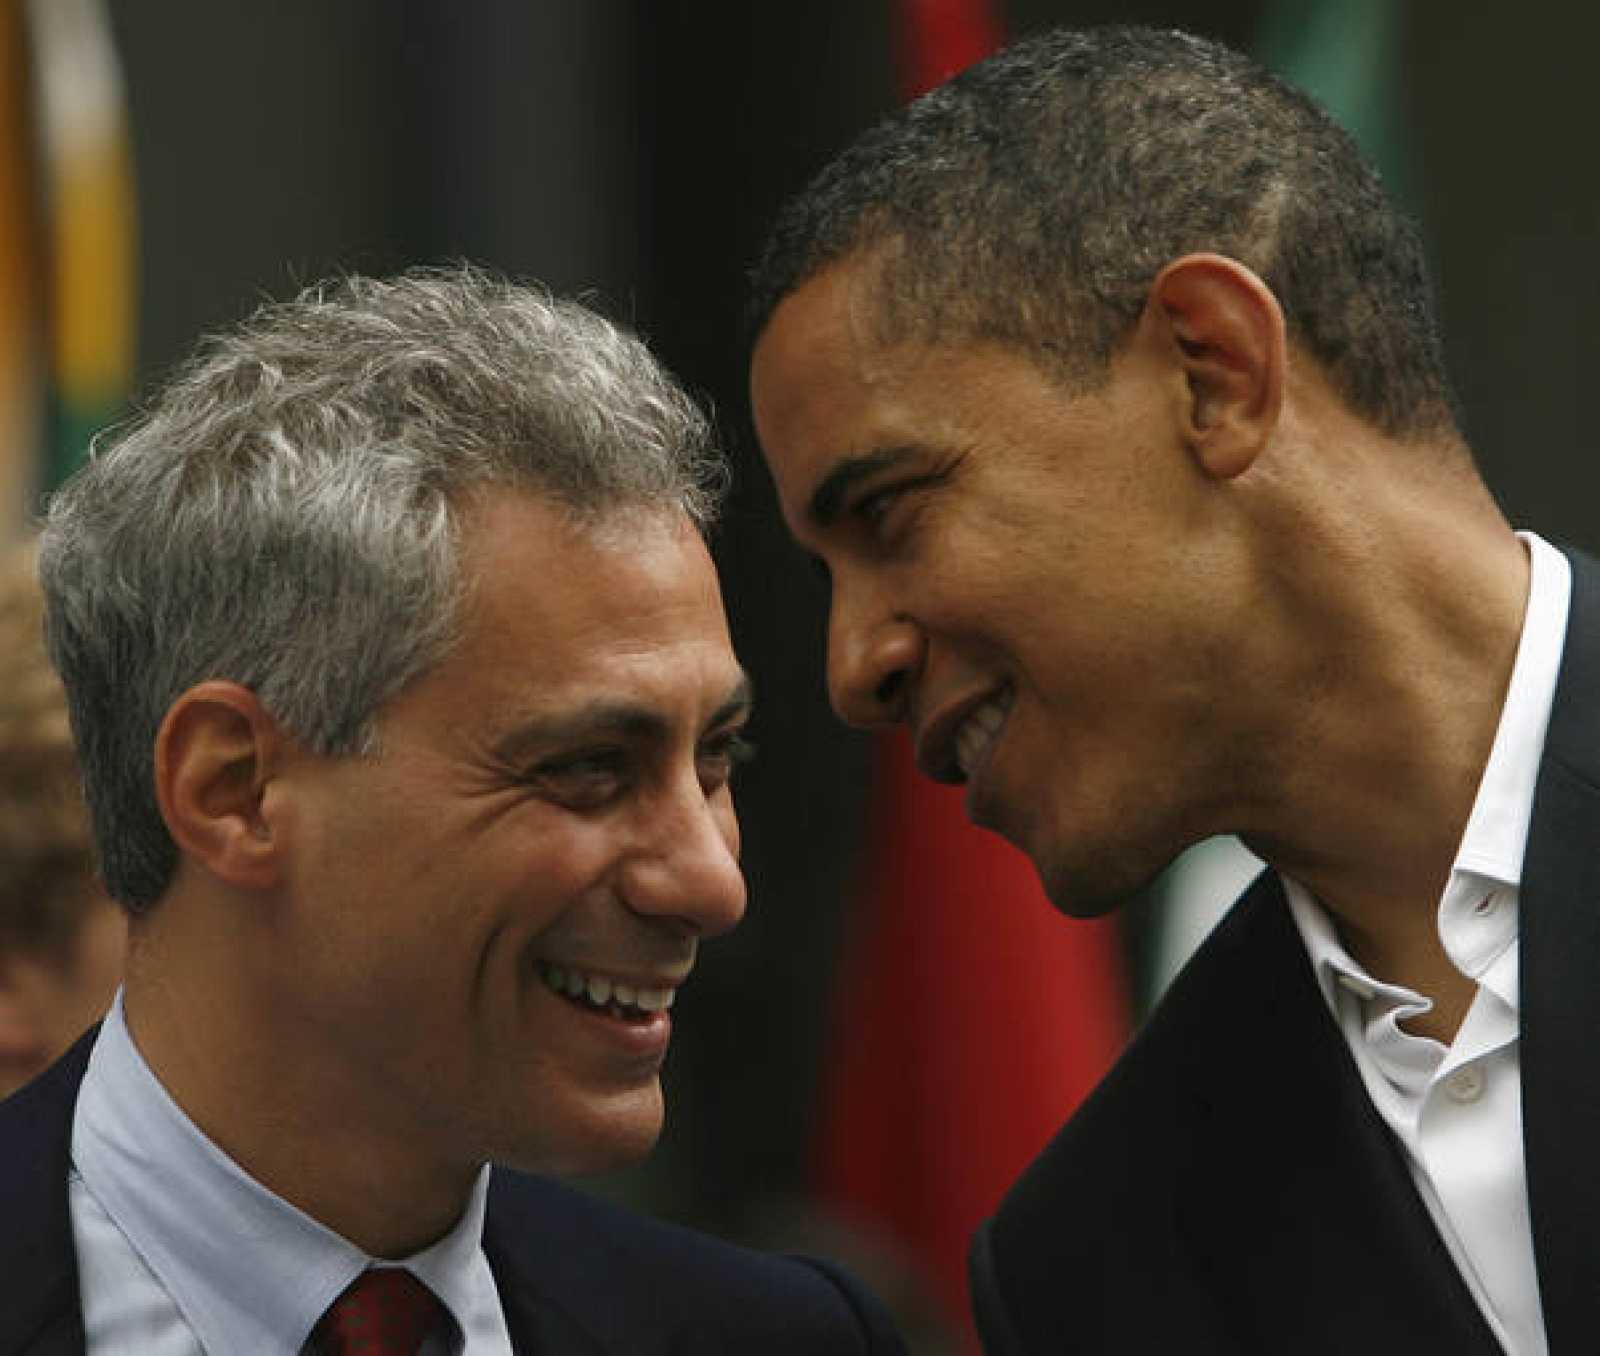 US Democratic presidential candidate Senator Barack Obama campaigns in Chicago